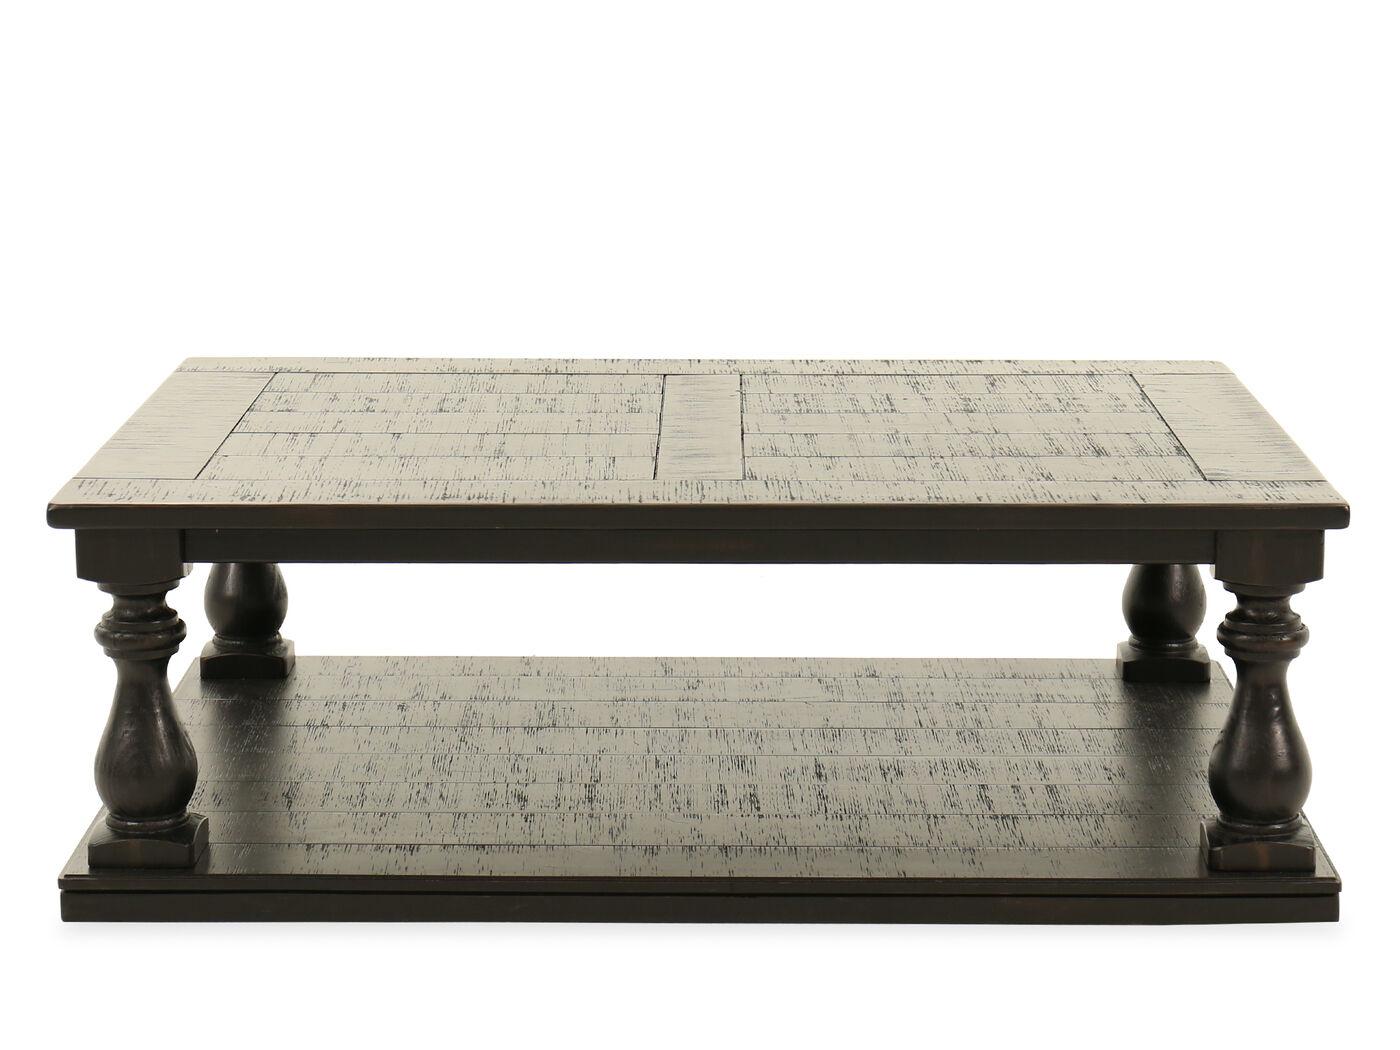 Plank top rectangular casual cocktail tablenbsp